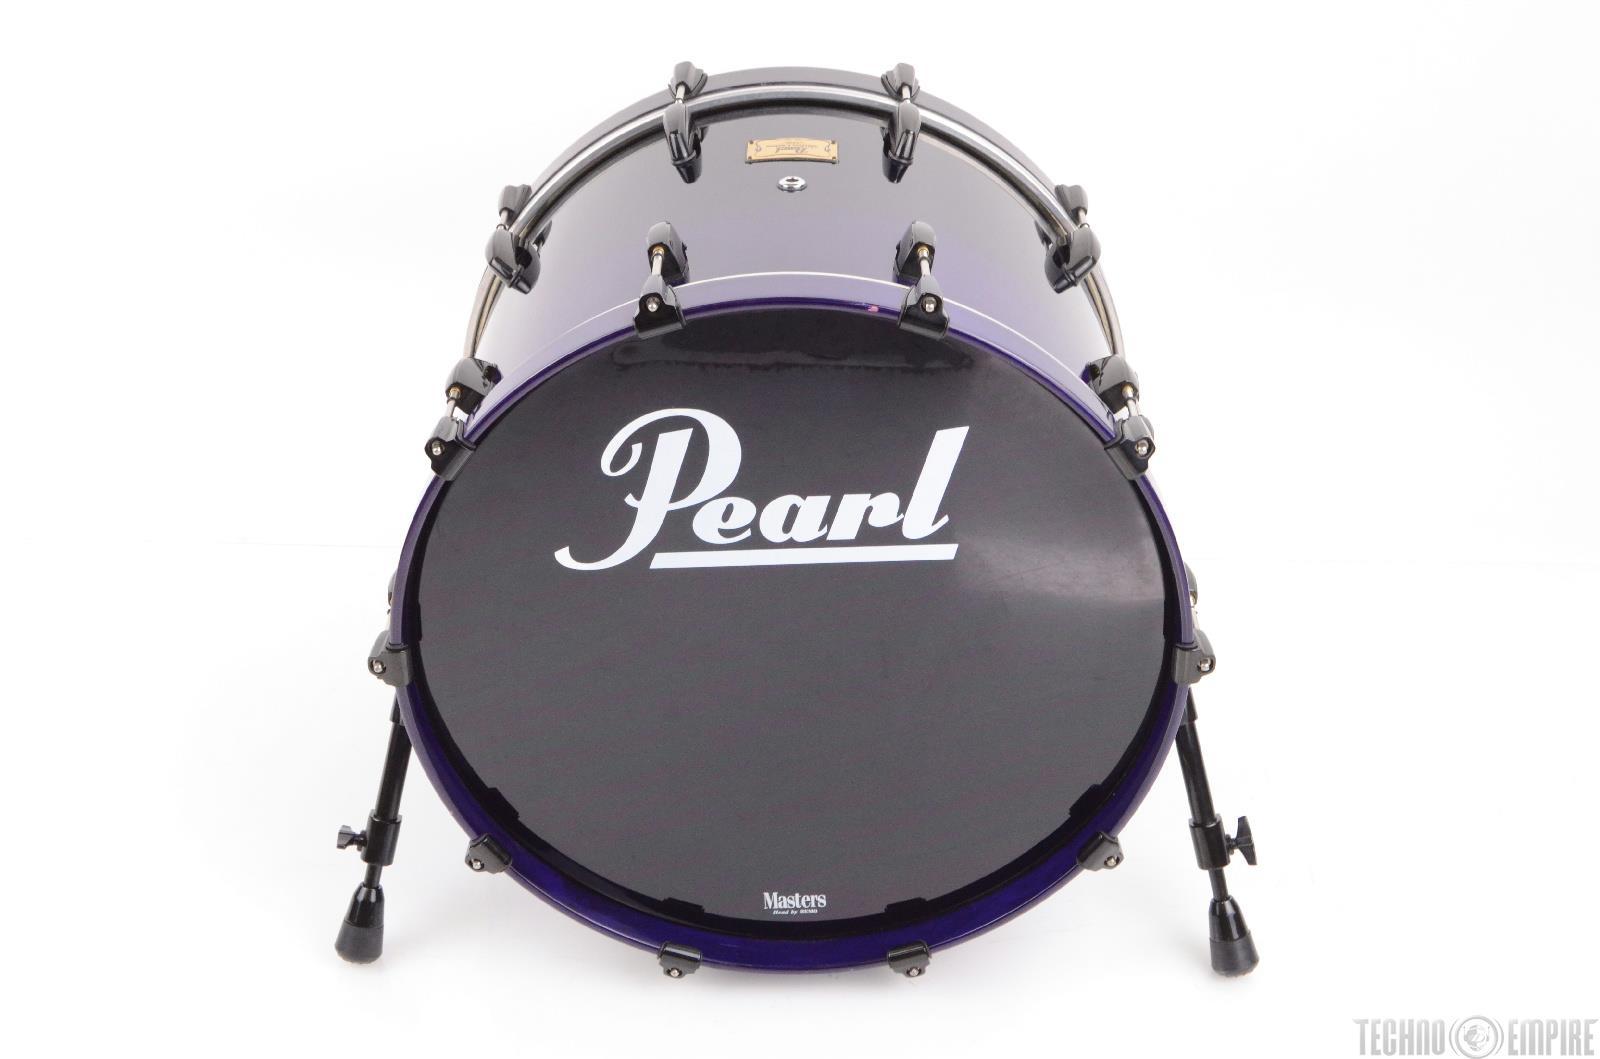 pearl masters custom 16 x 22 extra maple kick bass drum virgil donati 21390 ebay. Black Bedroom Furniture Sets. Home Design Ideas